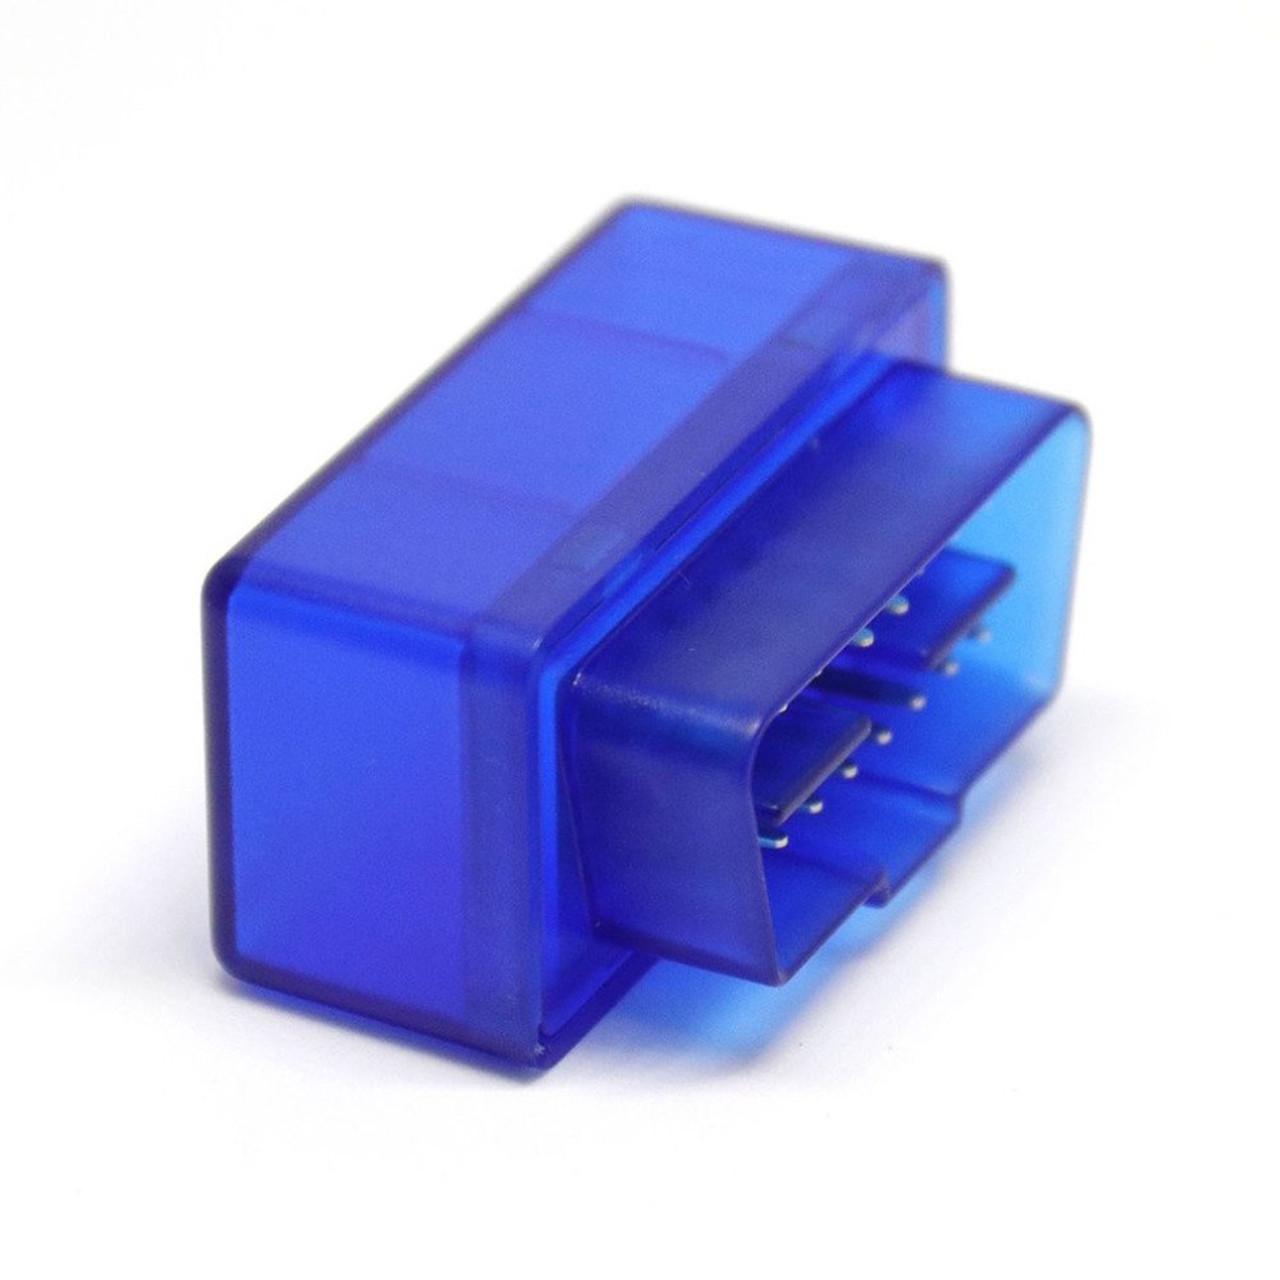 Сканер-адаптер Viecar V01L2-1 для диагностики автомобиля OBDII Bluetooth 2.0 (2781-8580а)